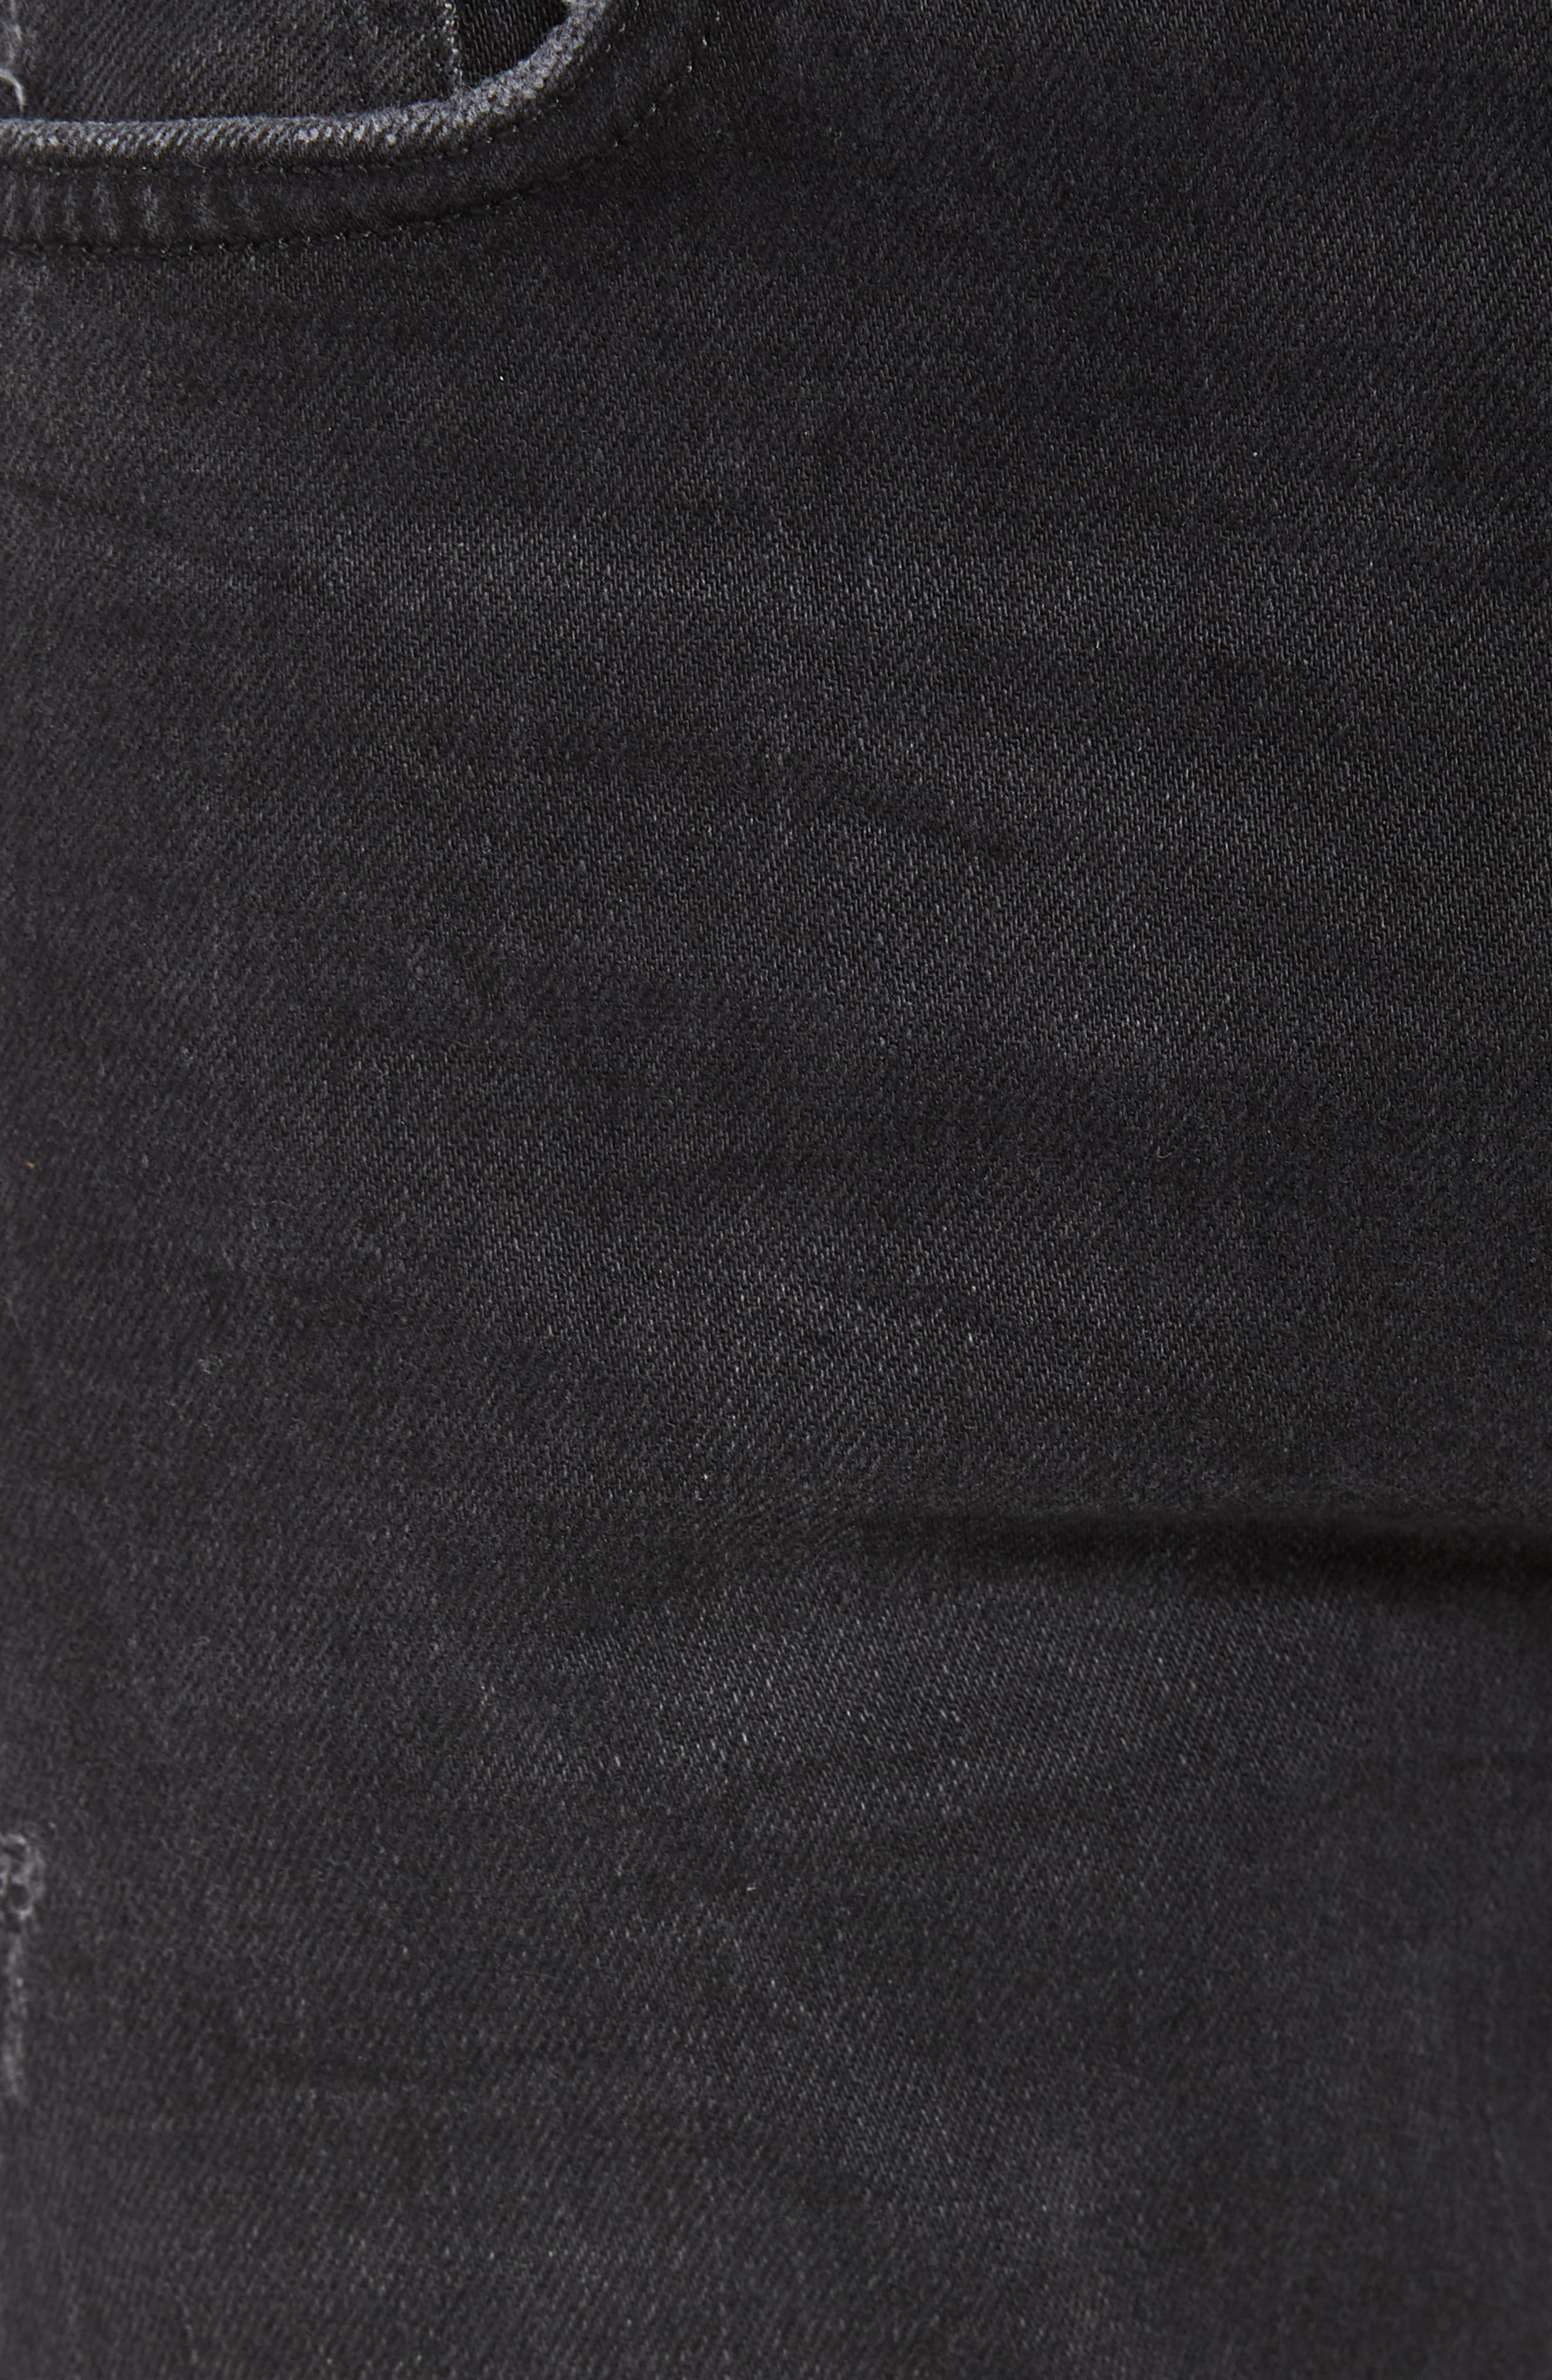 Raveline Skinny Fit Jeans,                             Alternate thumbnail 5, color,                             001